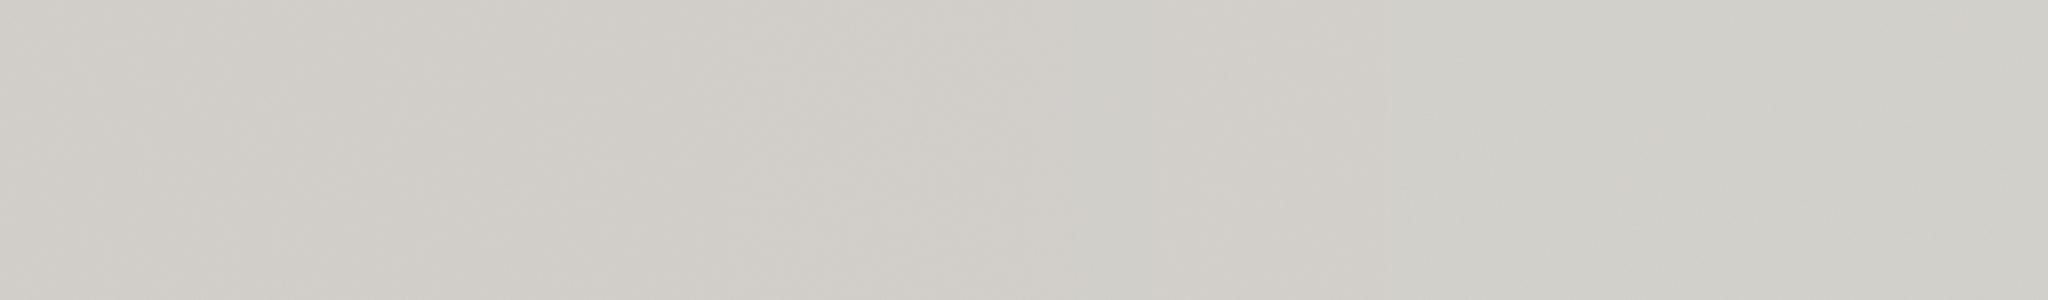 HU 171191 ABS Kante Kongo Grau glatt Supermatt